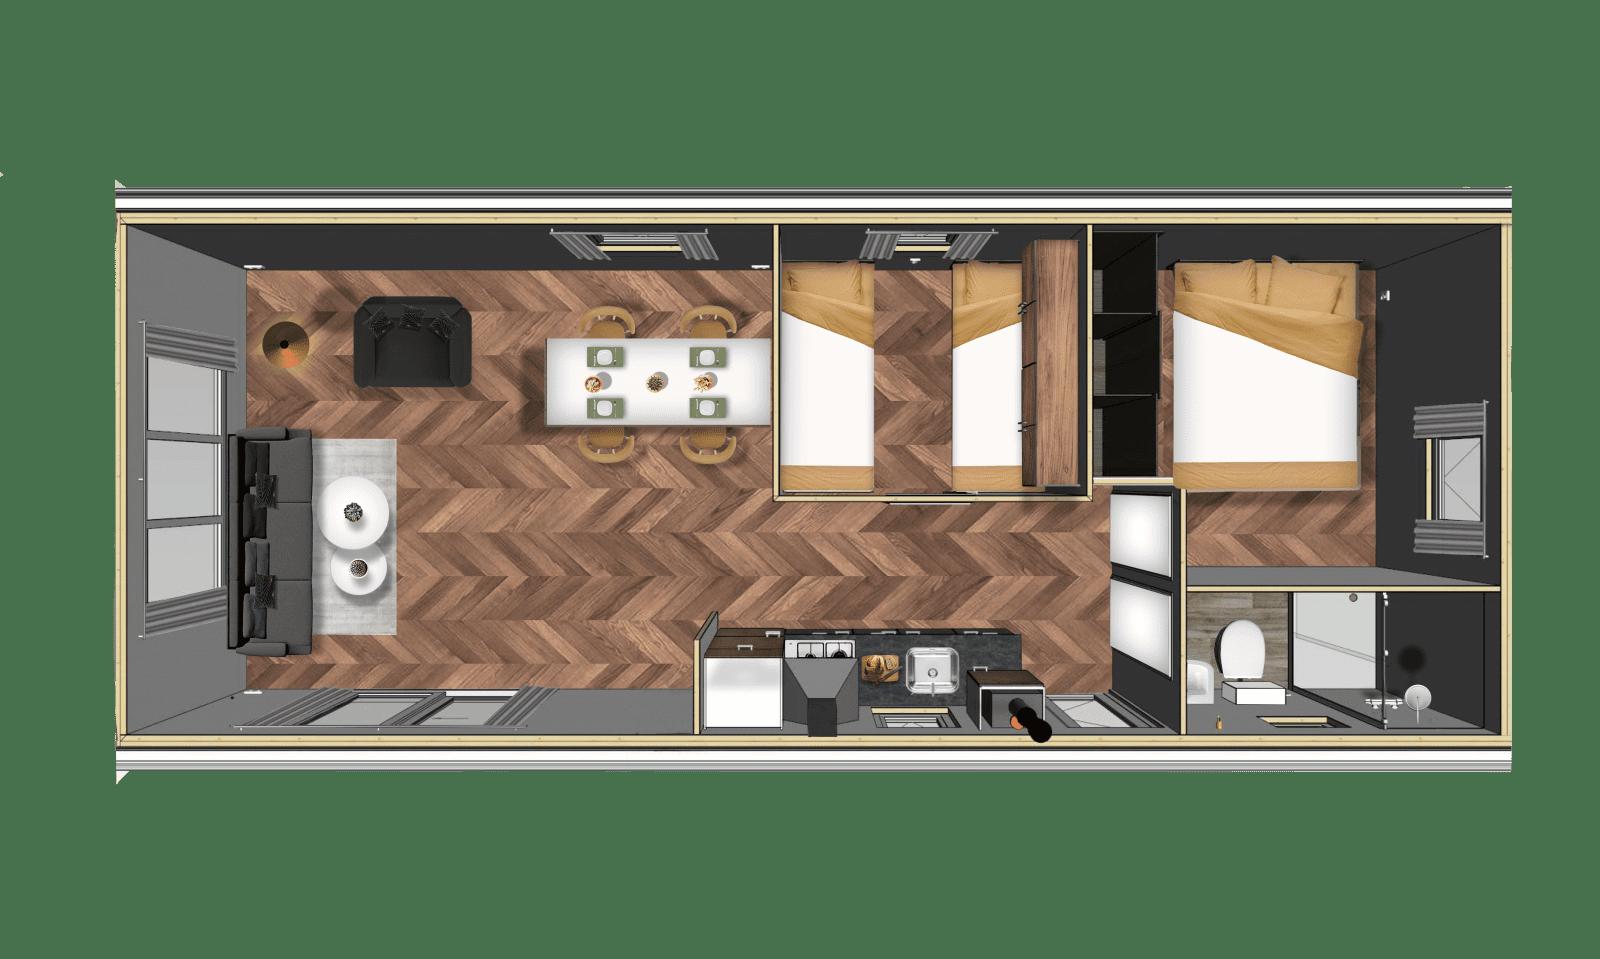 Chalet Basic XL 2.0 - Plattegrond